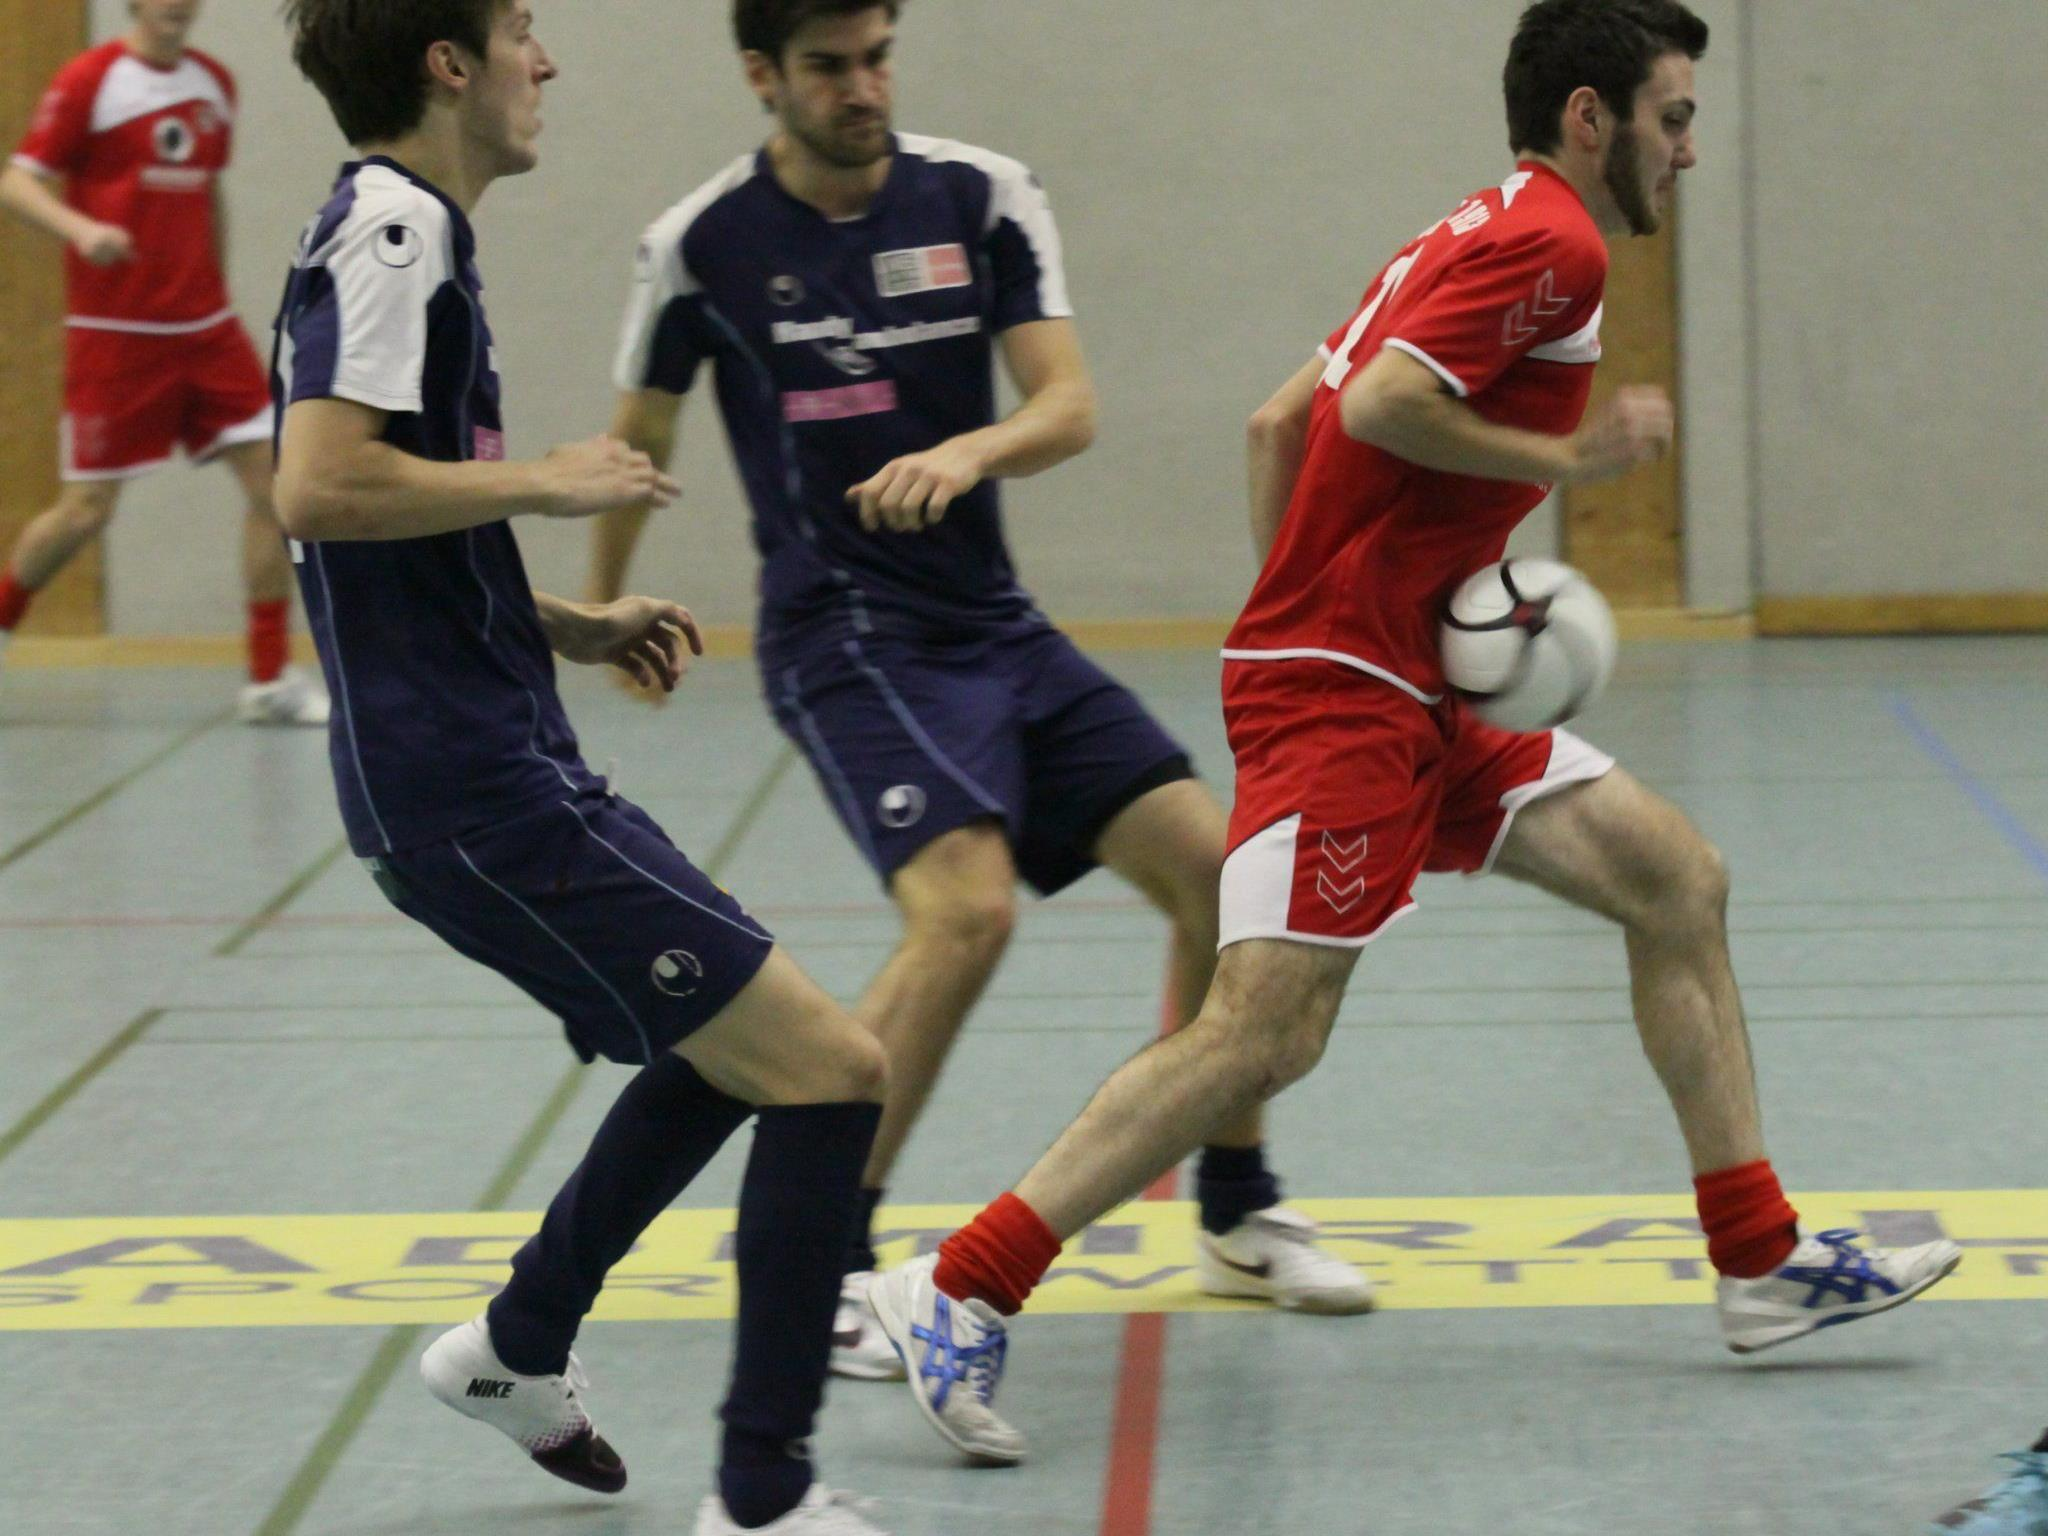 FCD-Kicker Gültekin Sönmez hat zur alten Form zurückgefunden.